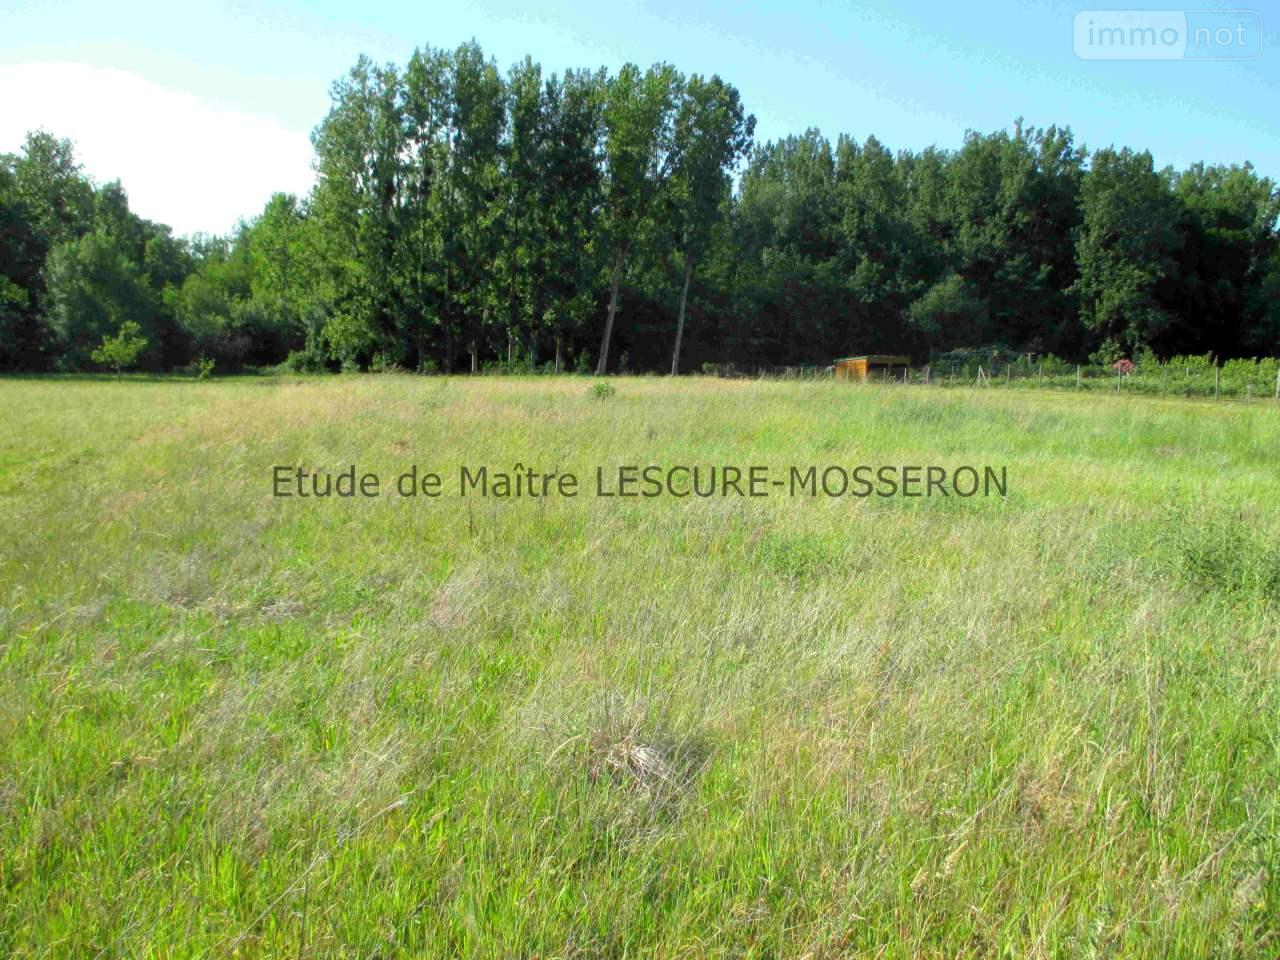 Terrains de loisirs bois etangs a vendre Chailles 41120 Loir-et-Cher 2779 m2  8056 euros